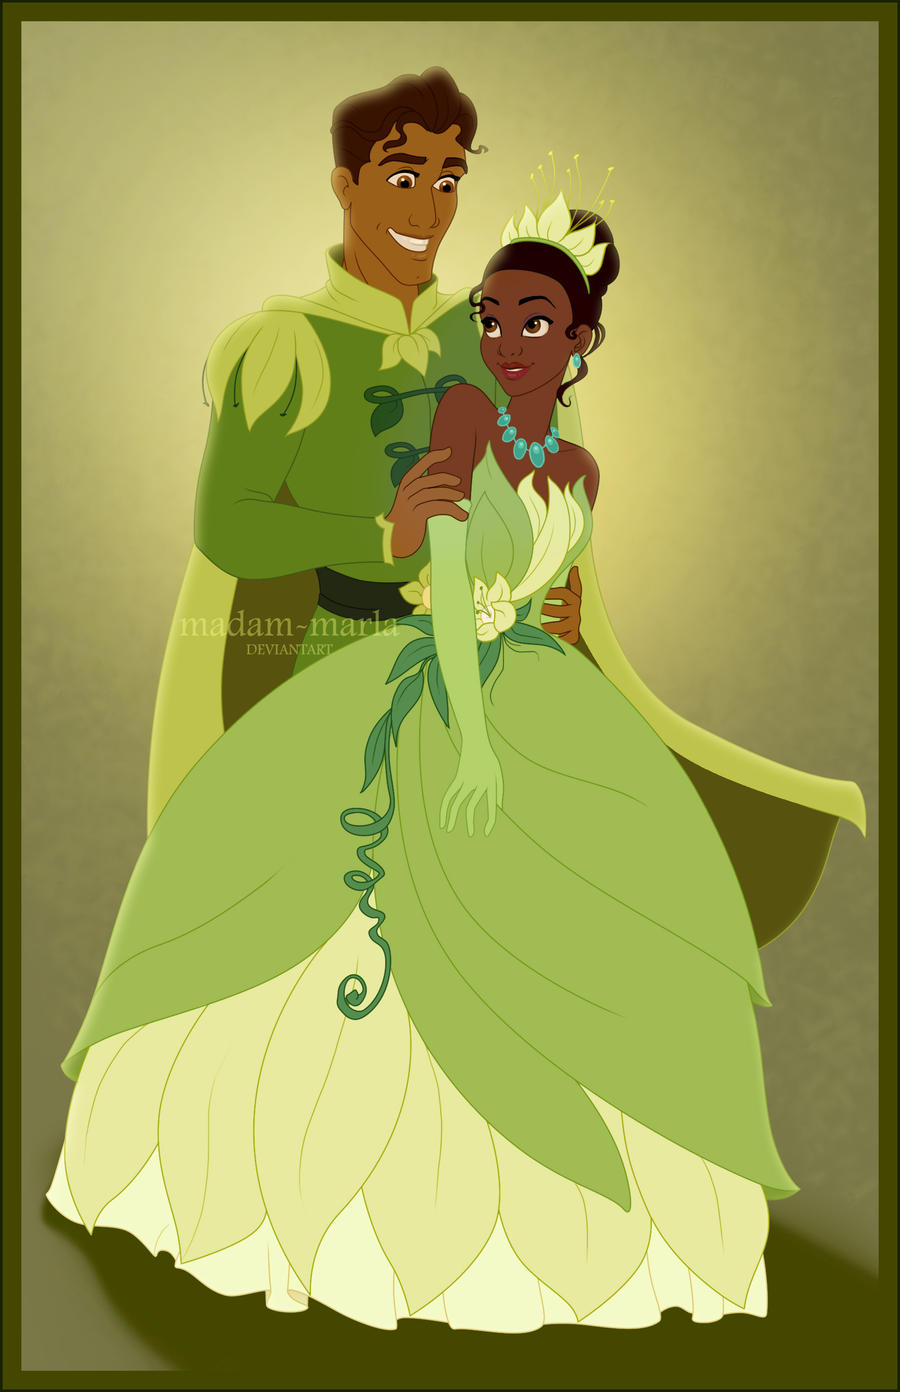 Tiana and Naveen by madam-marla on DeviantArt